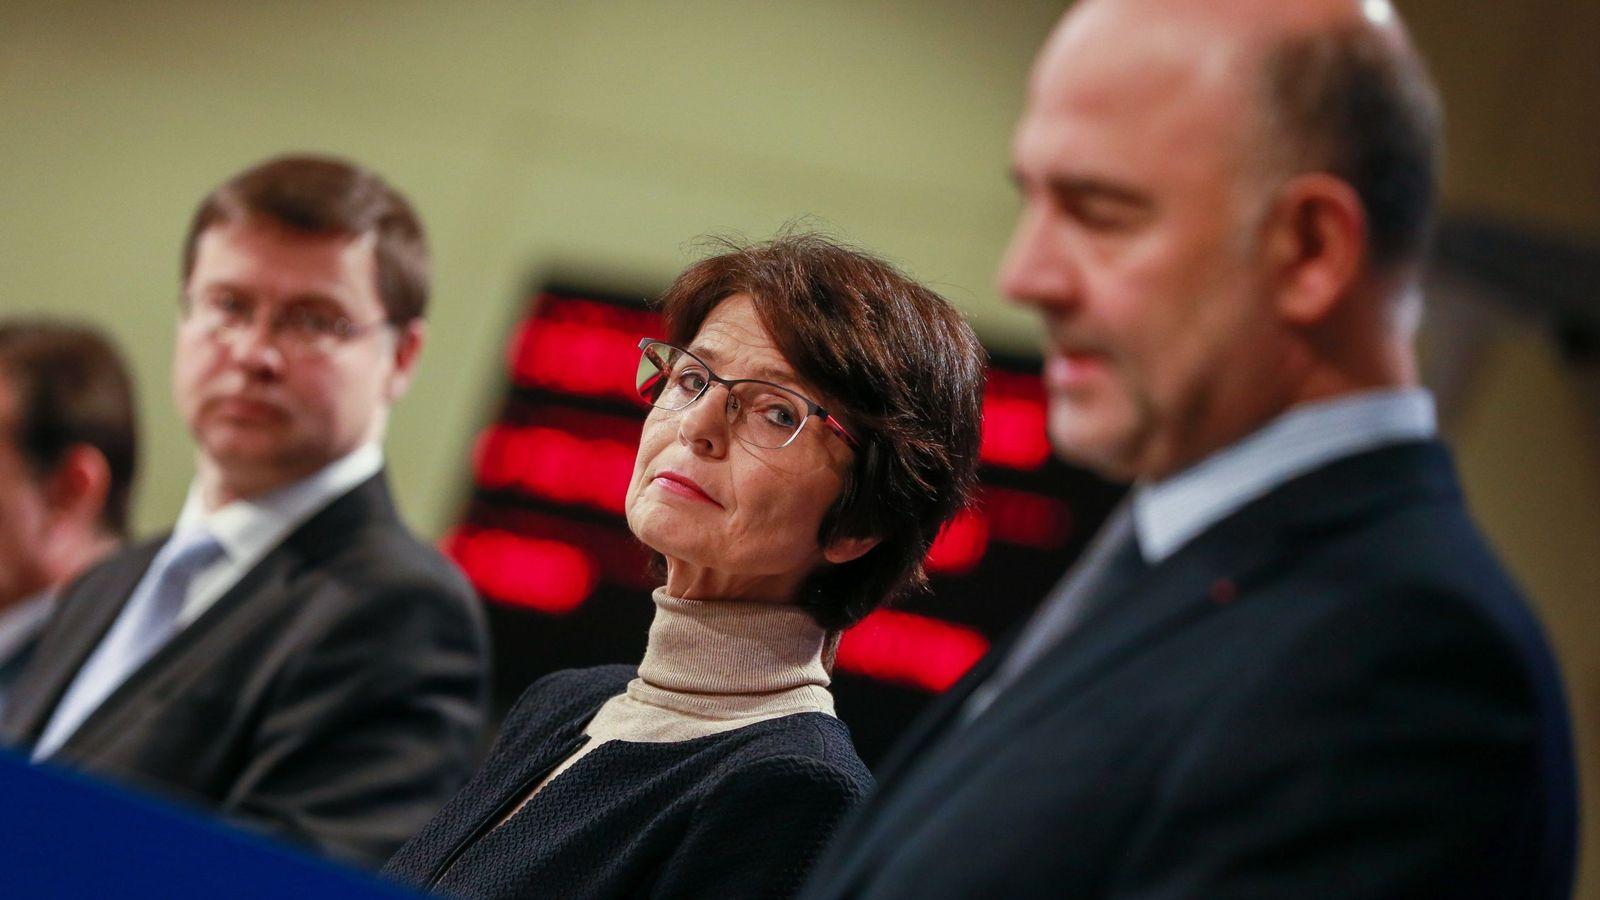 Foto: Valdis Dombrovskis, Marianne Thyssen y Pierre Moscovici, liberales que alimentan al populismo. (EFE)